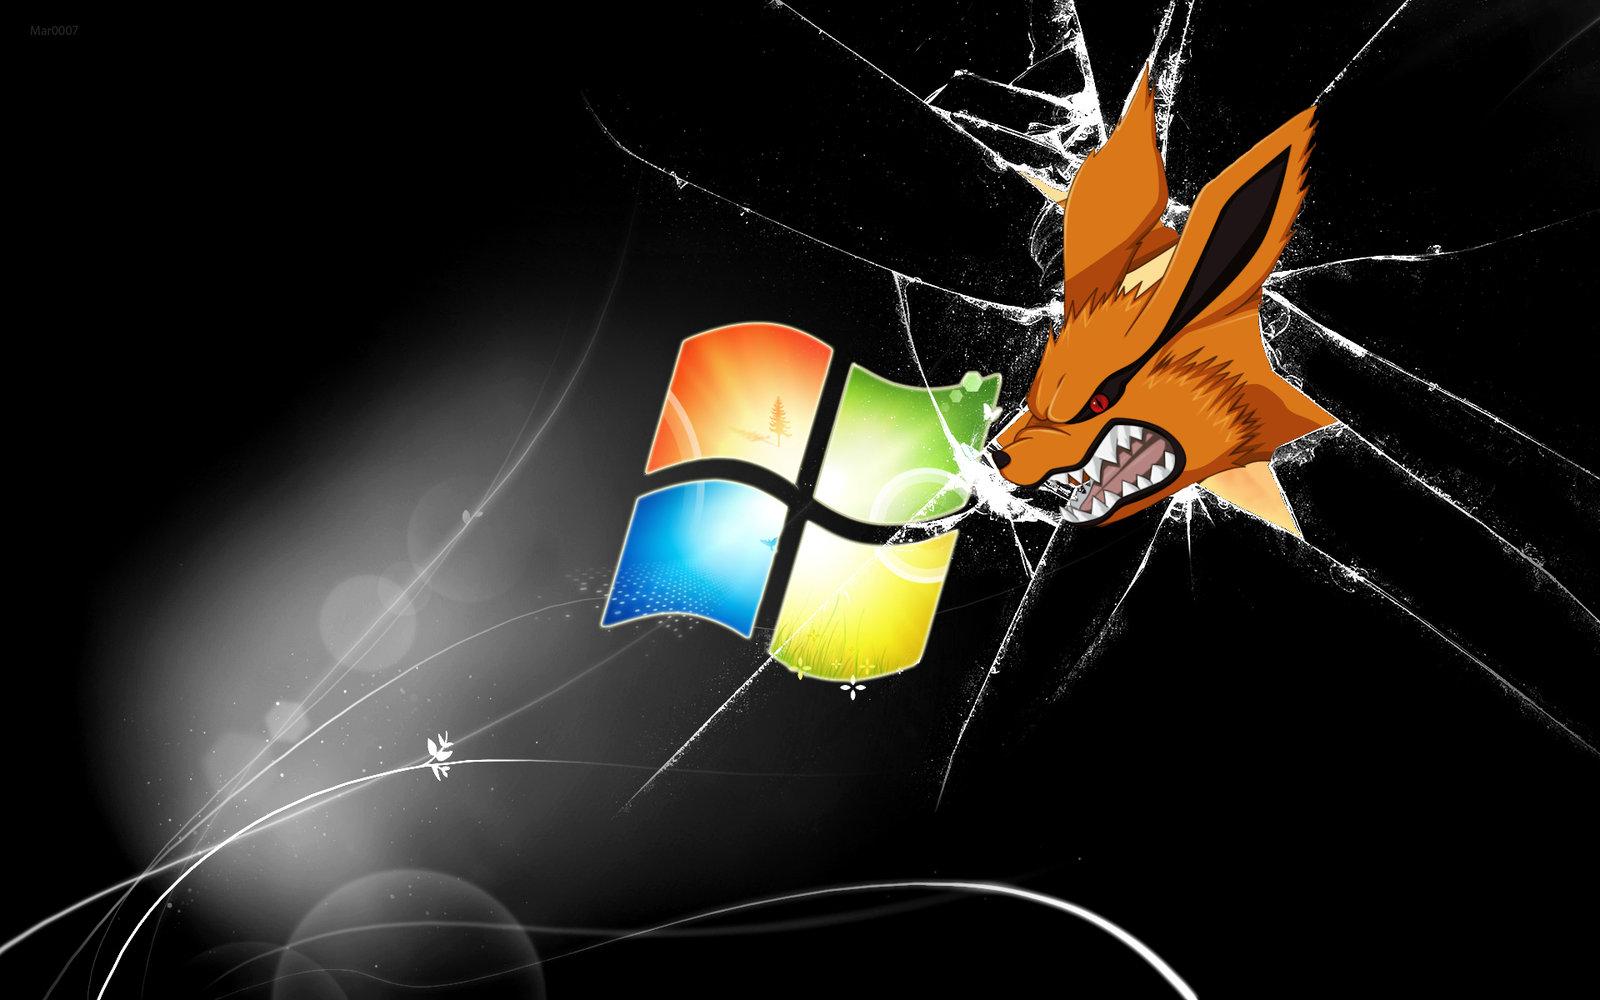 Nine Tailed Fox Windows Wallpaper by AlduinTheW0rld3ater 1600x1000